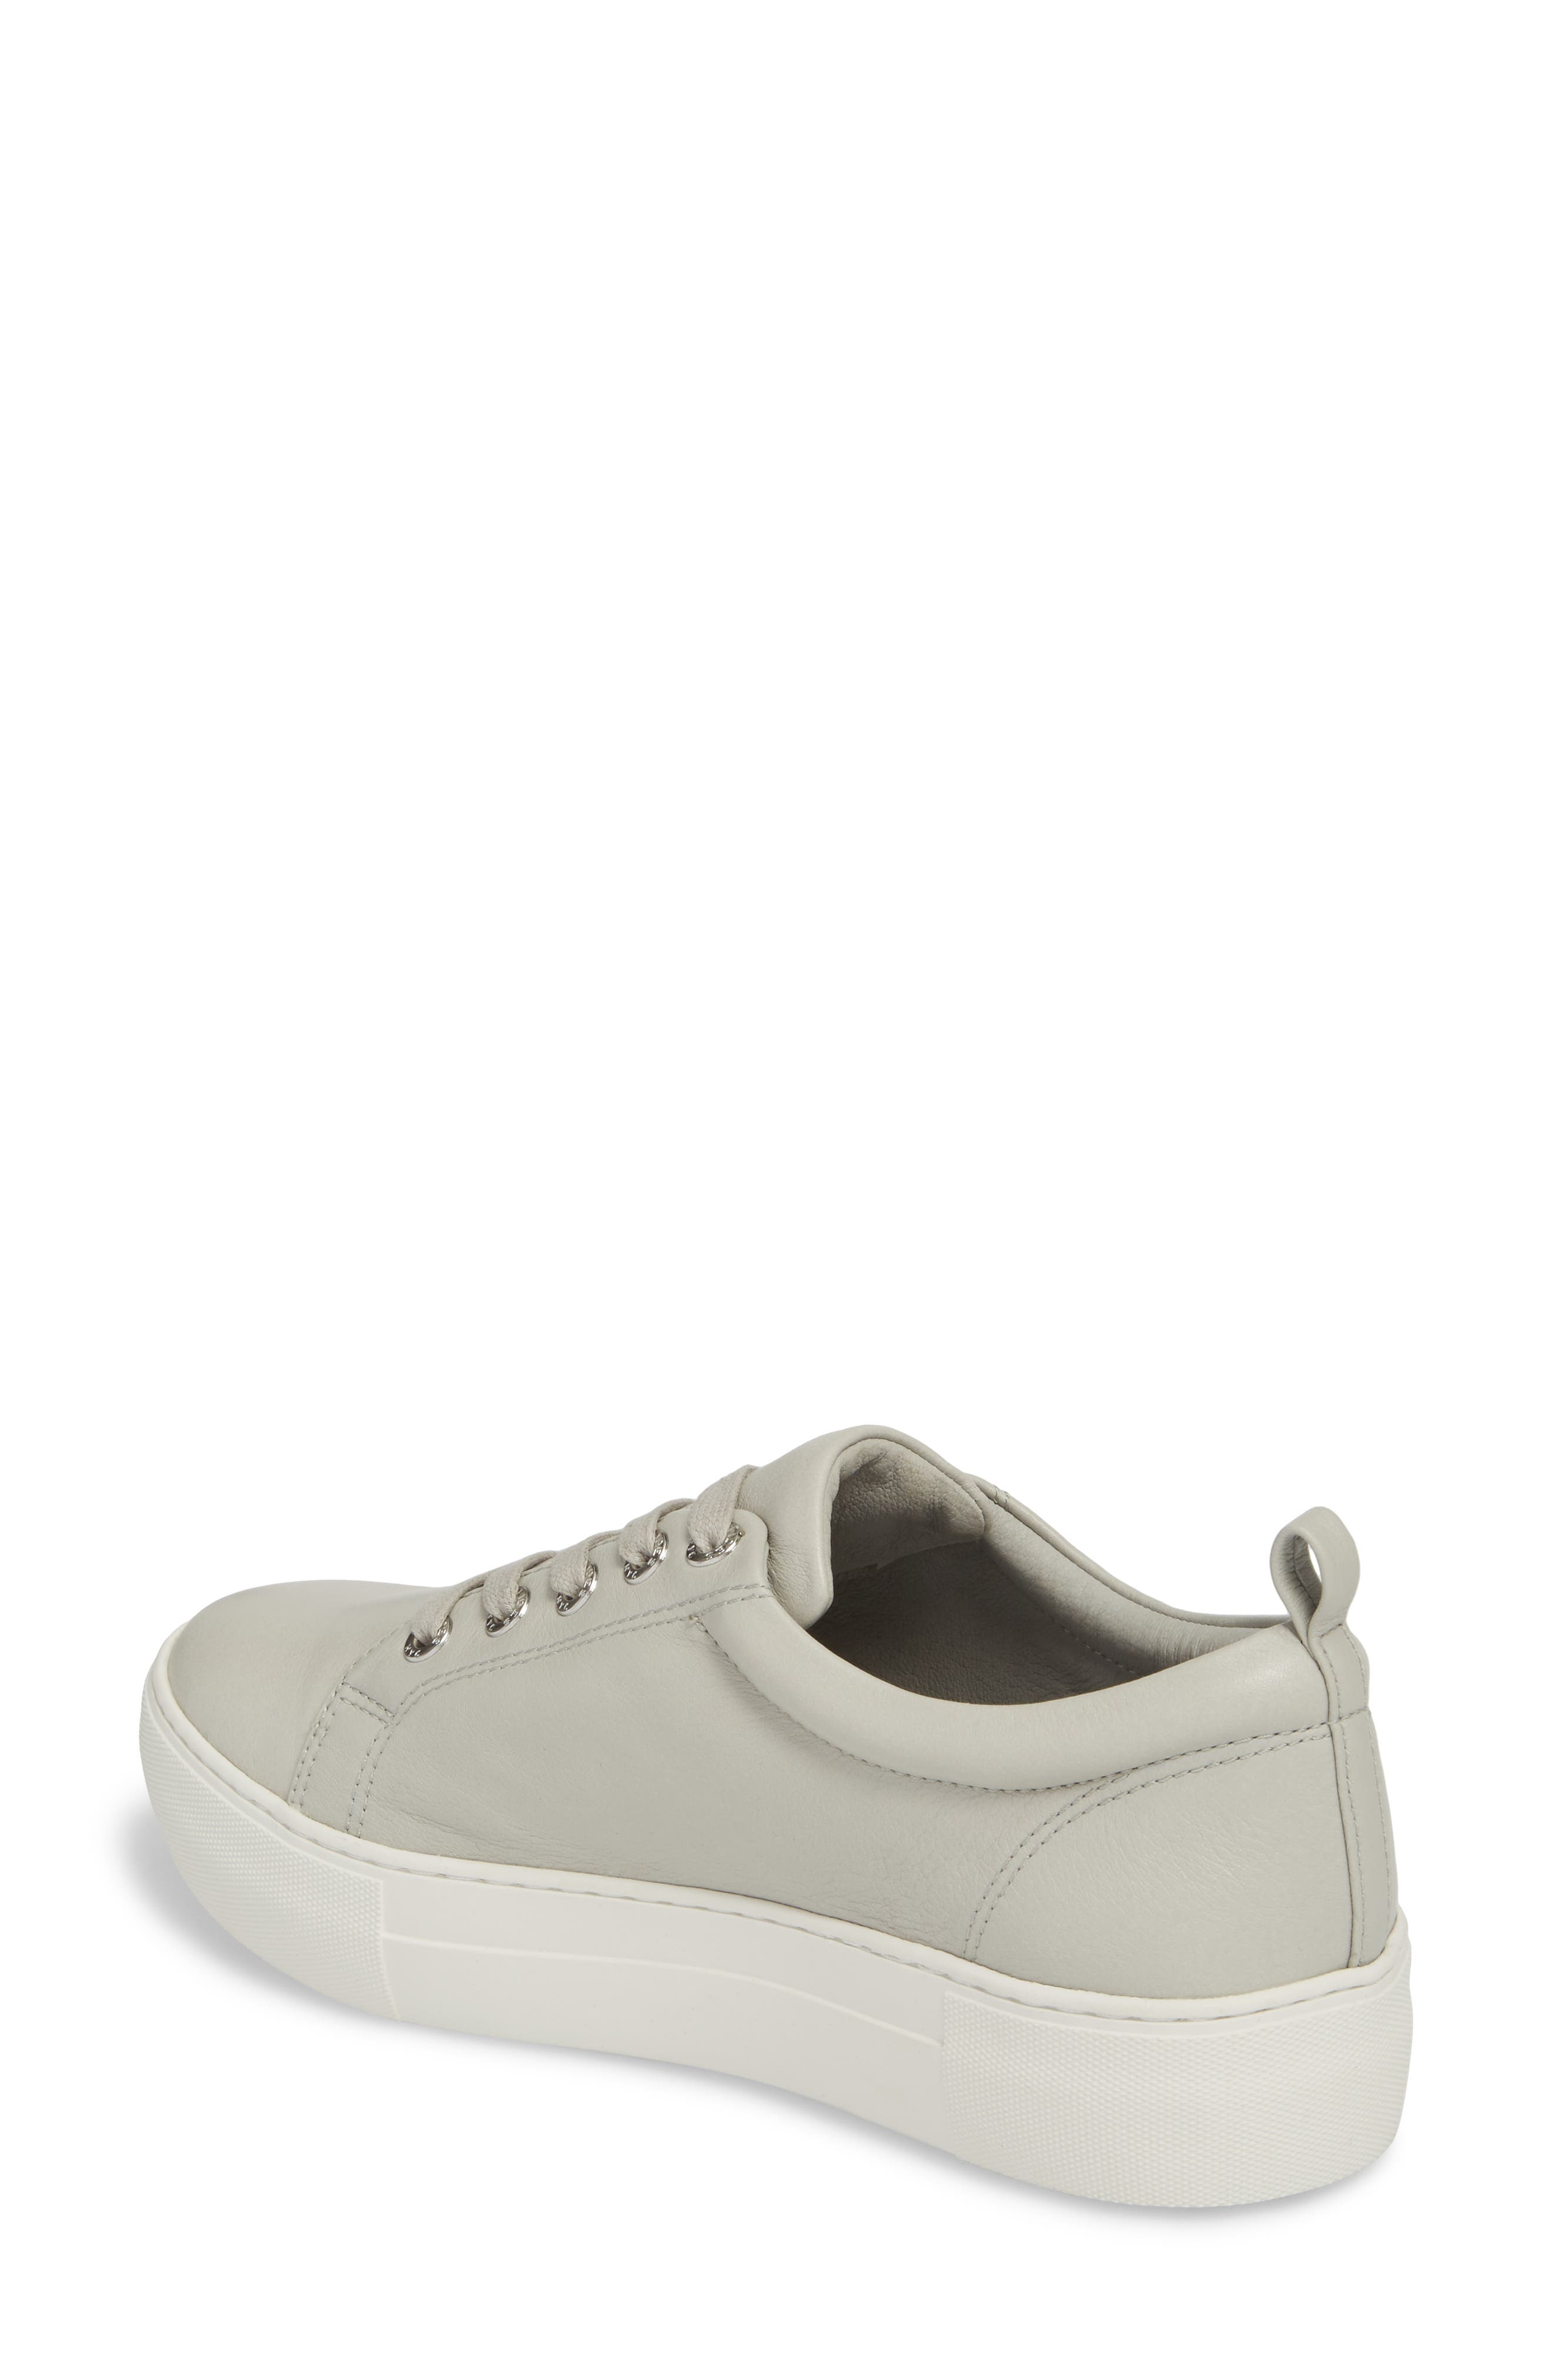 Adel Floral Sneaker,                             Alternate thumbnail 2, color,                             Light Grey Leather